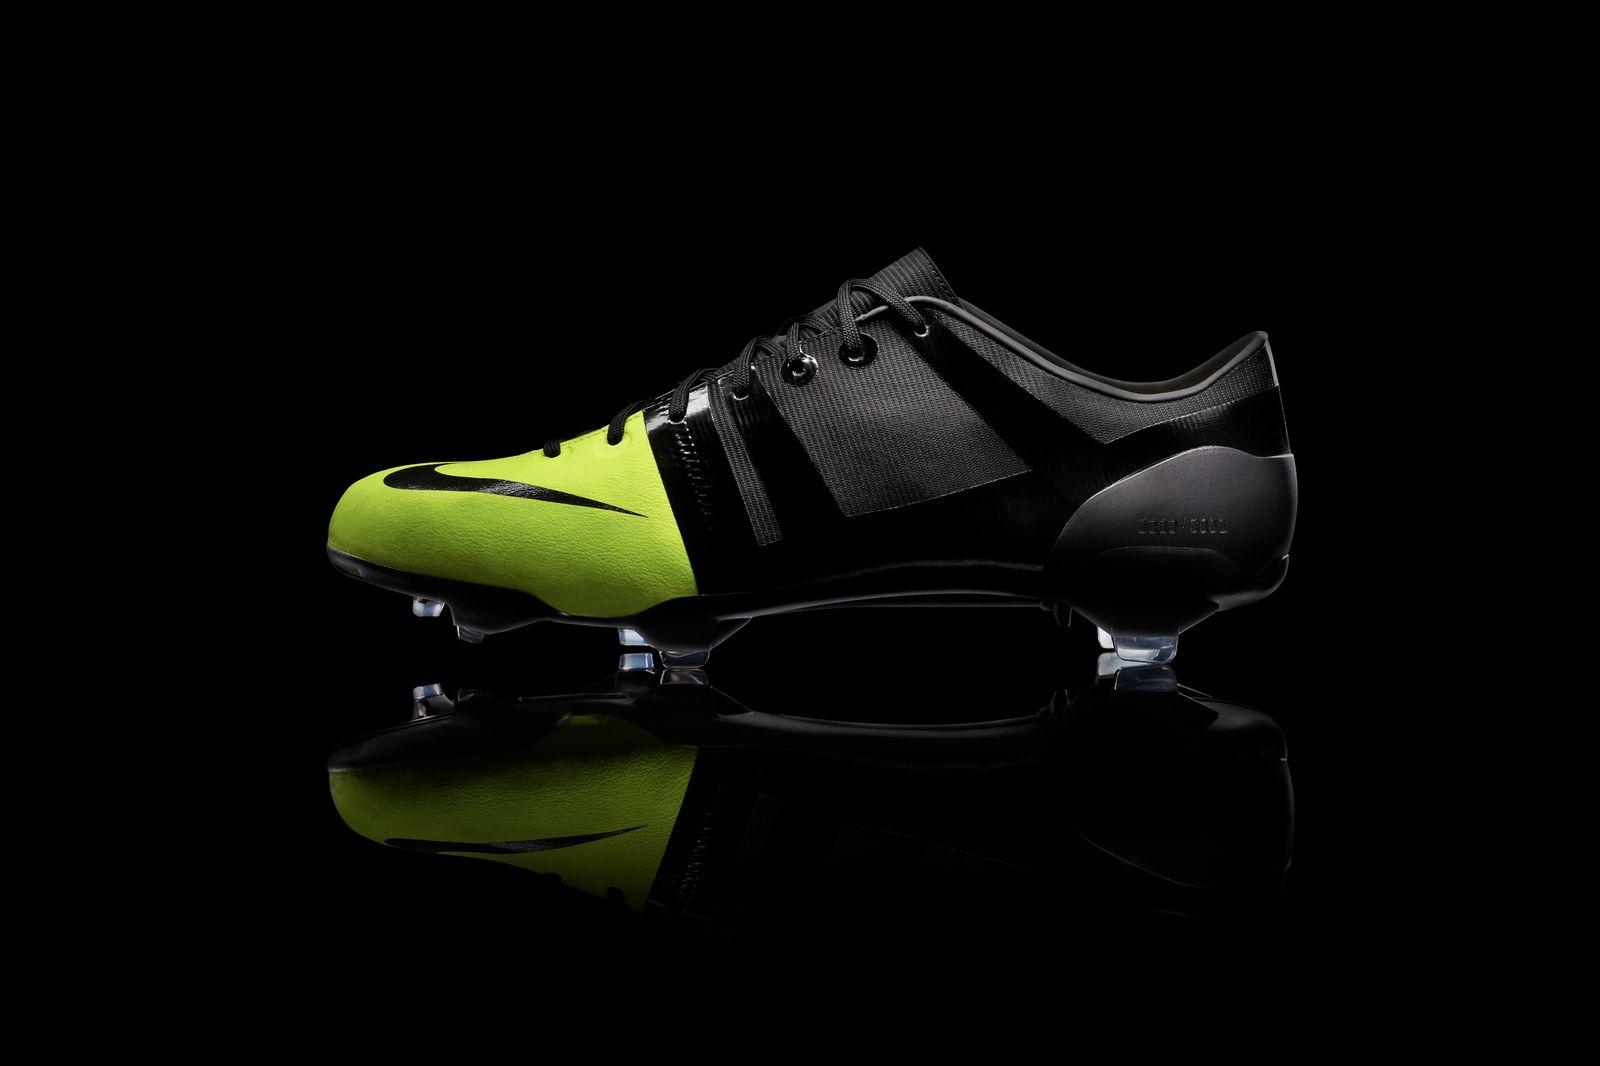 b6f348240 Nike Mercurial GS360 Boots Released - Footy Headlines